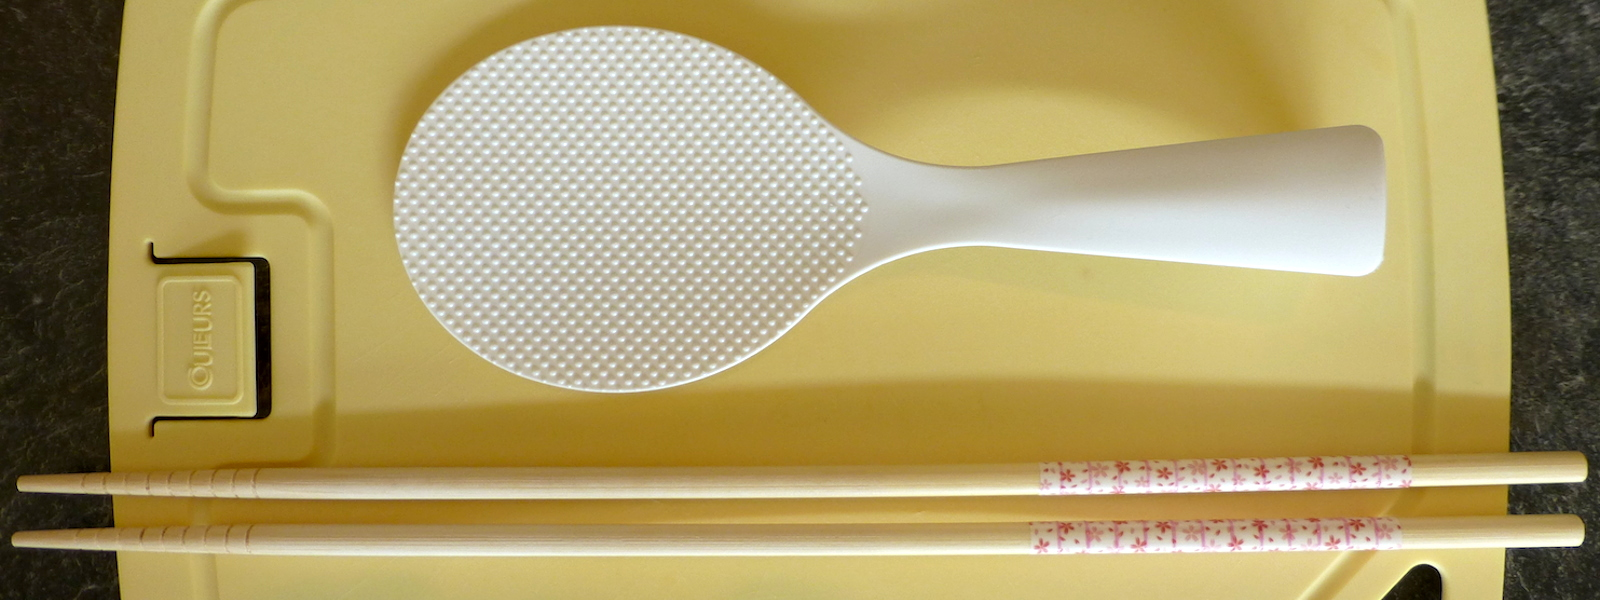 Three of my favourite Japanese kitchen tools